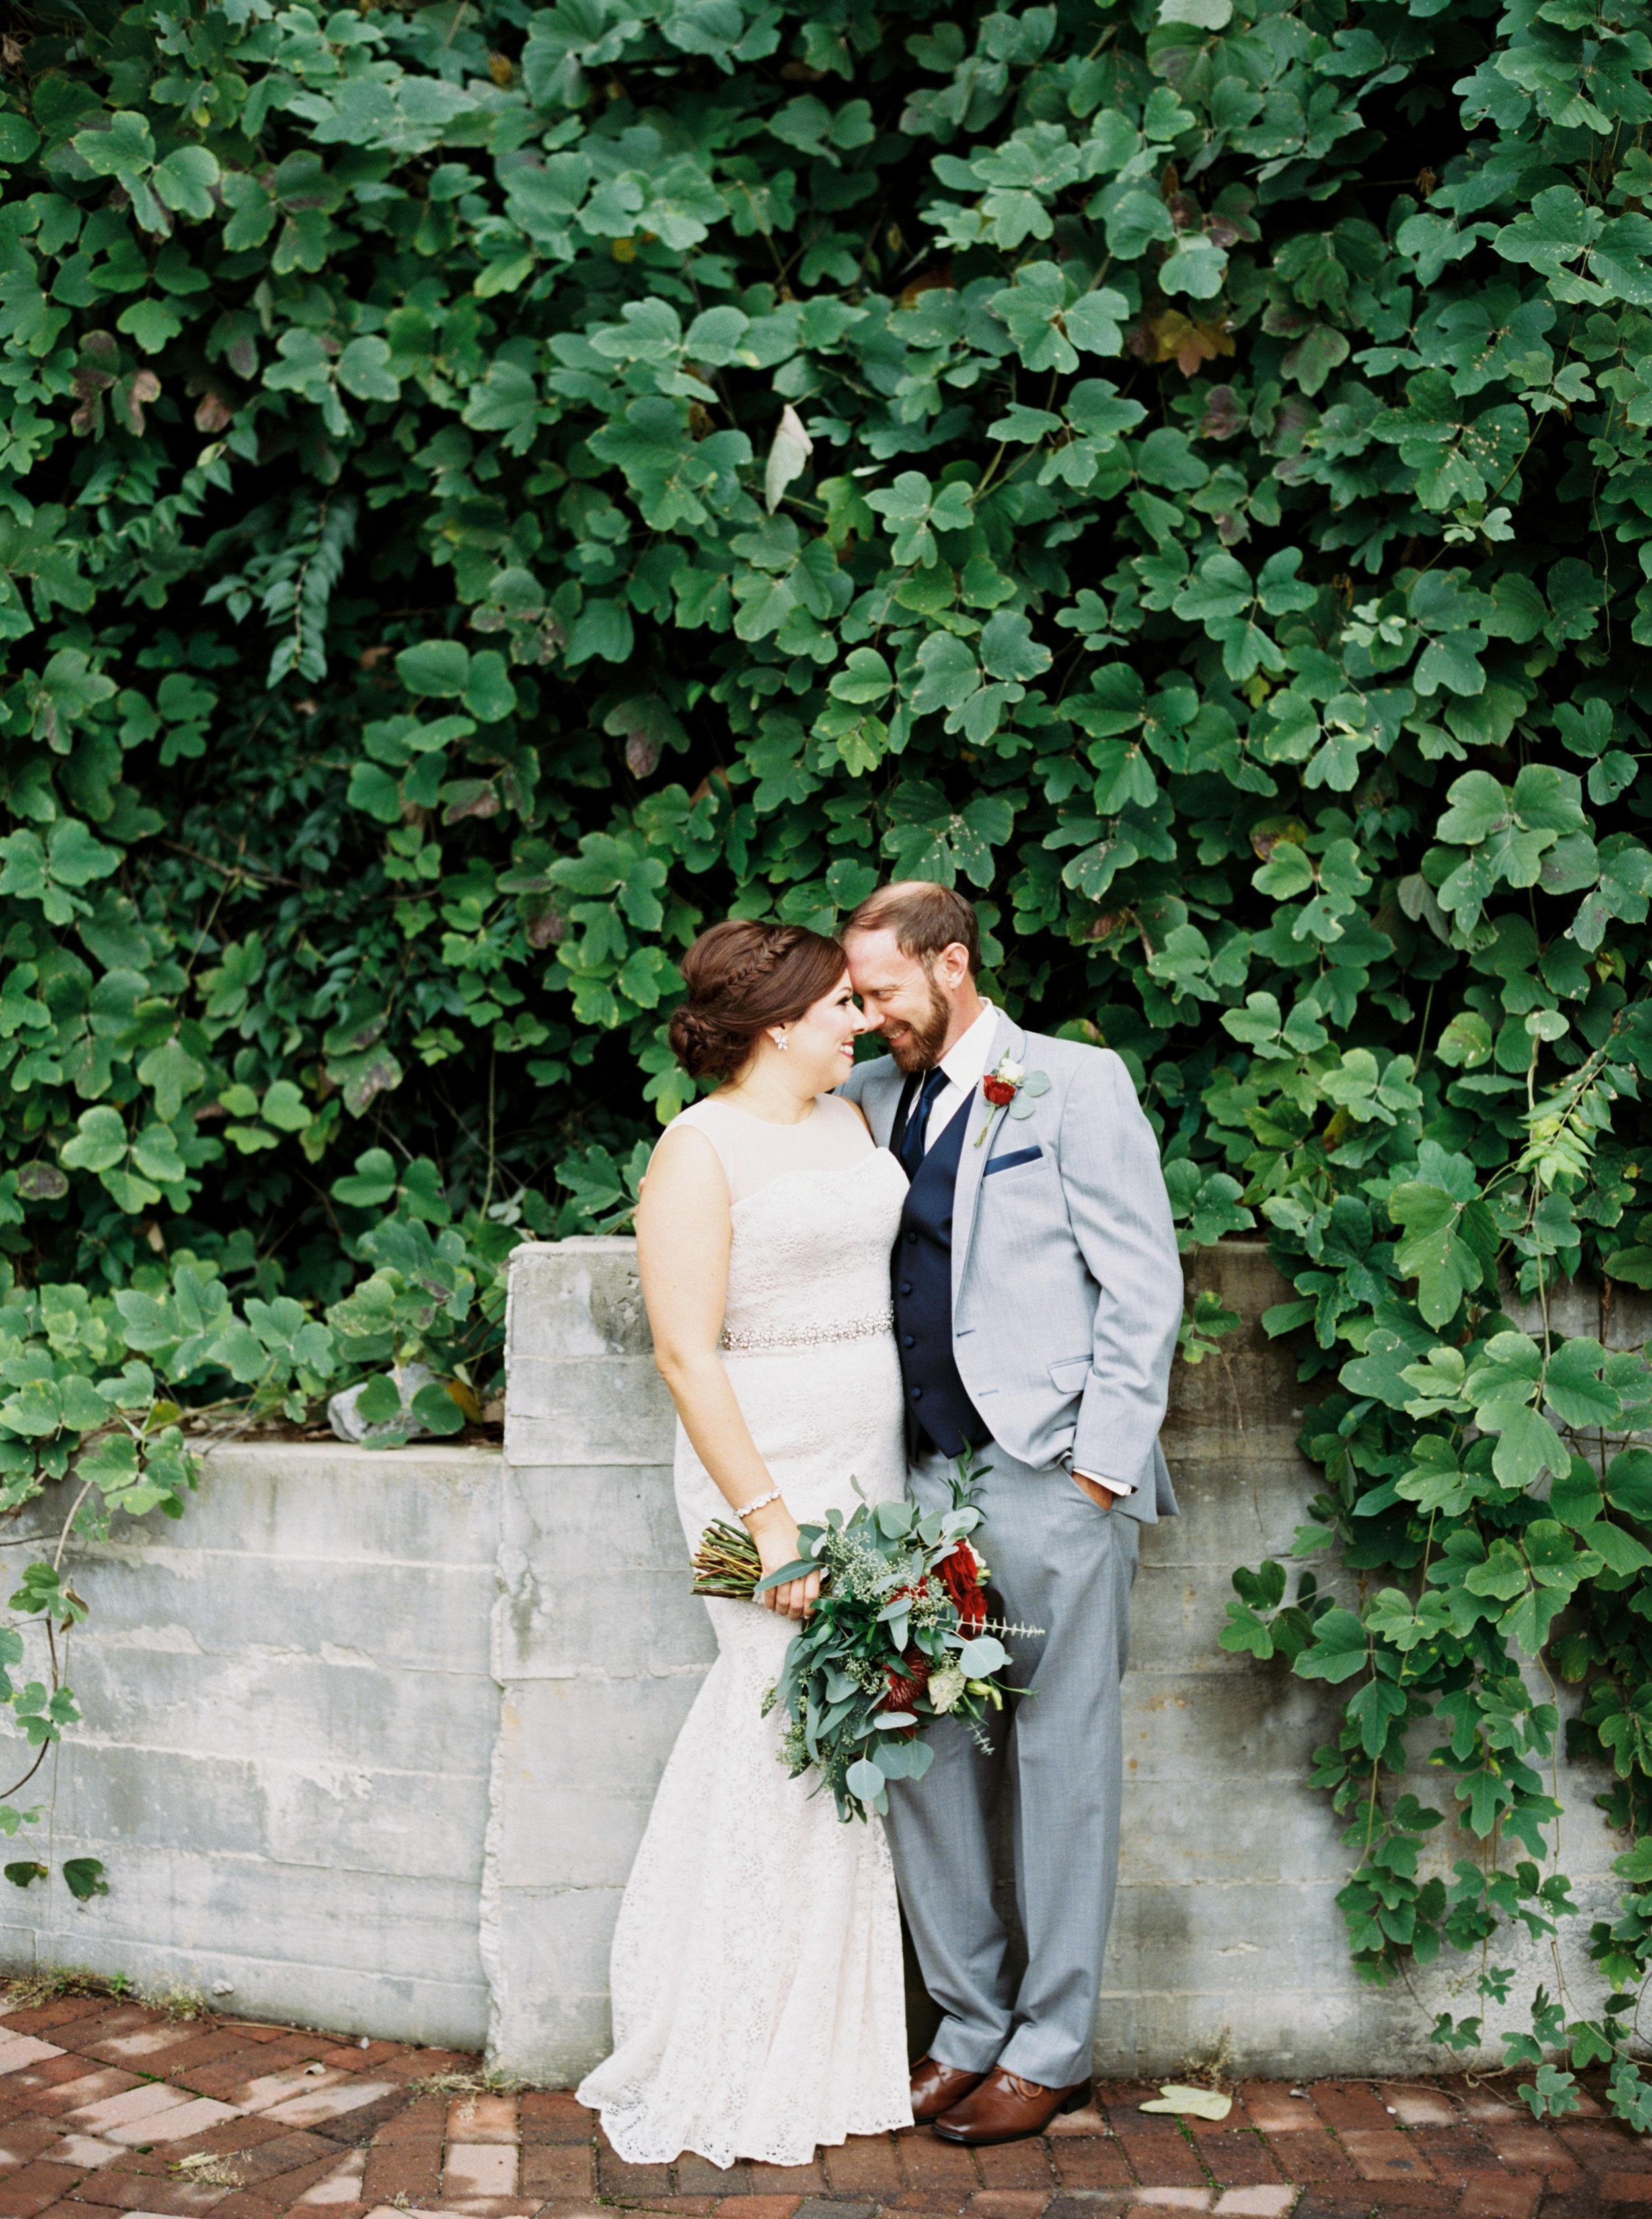 Jessica_Bryan_Wedding_Standard_Knoxville_Abigail_Malone_Photography-241.jpg